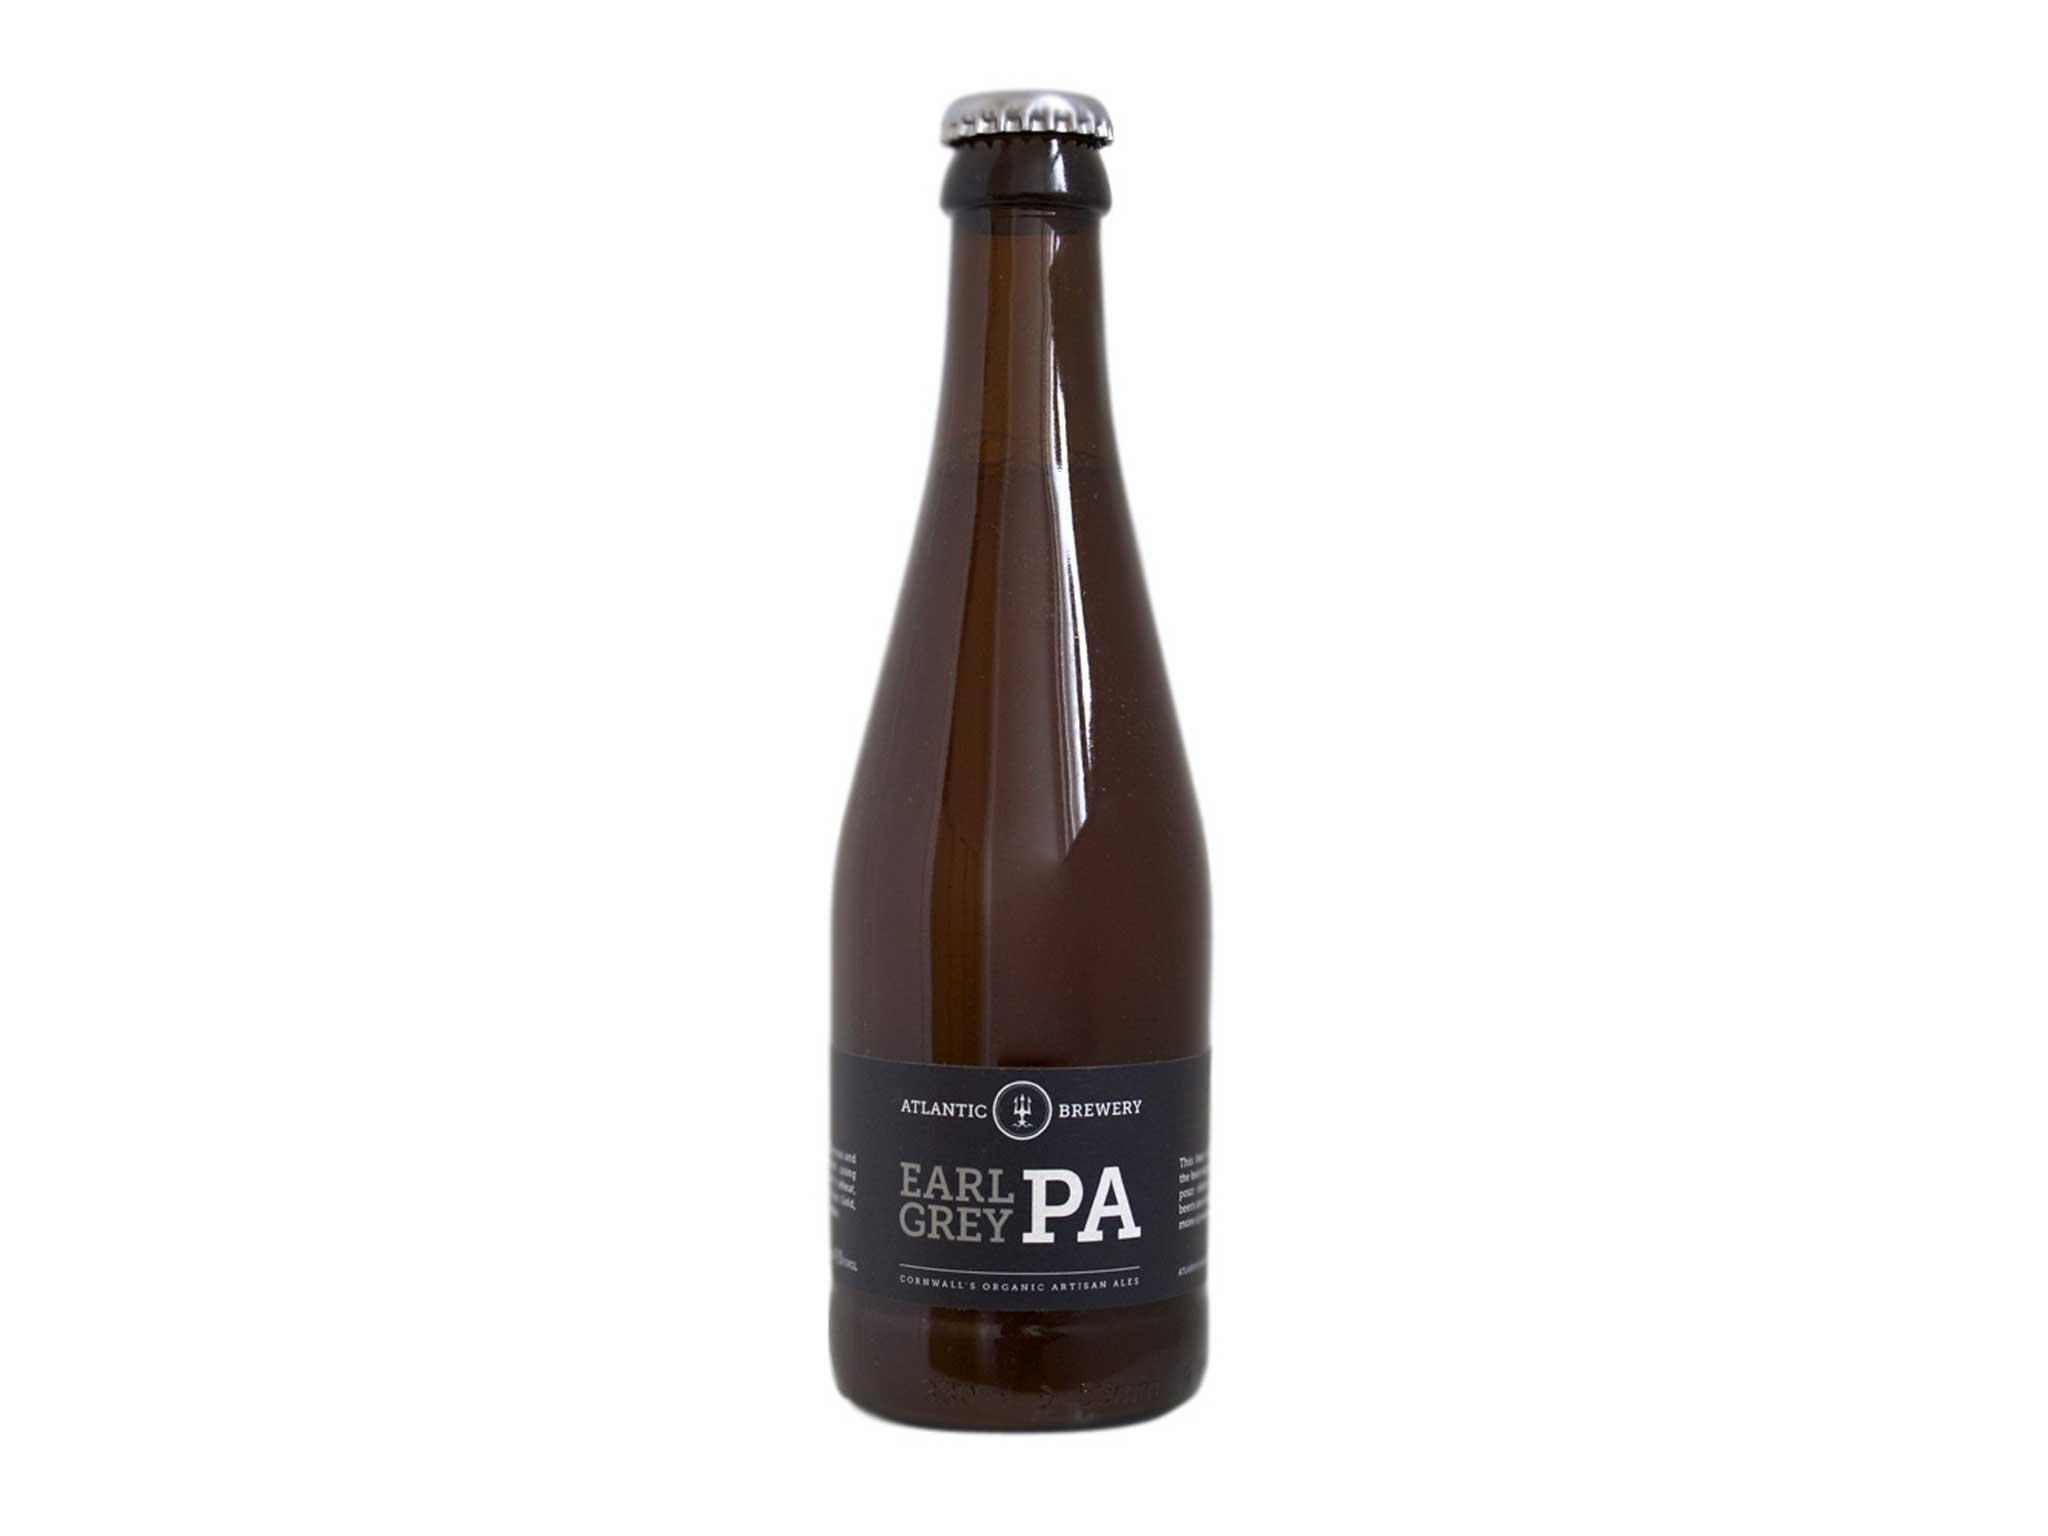 10 best organic beers | The Independent